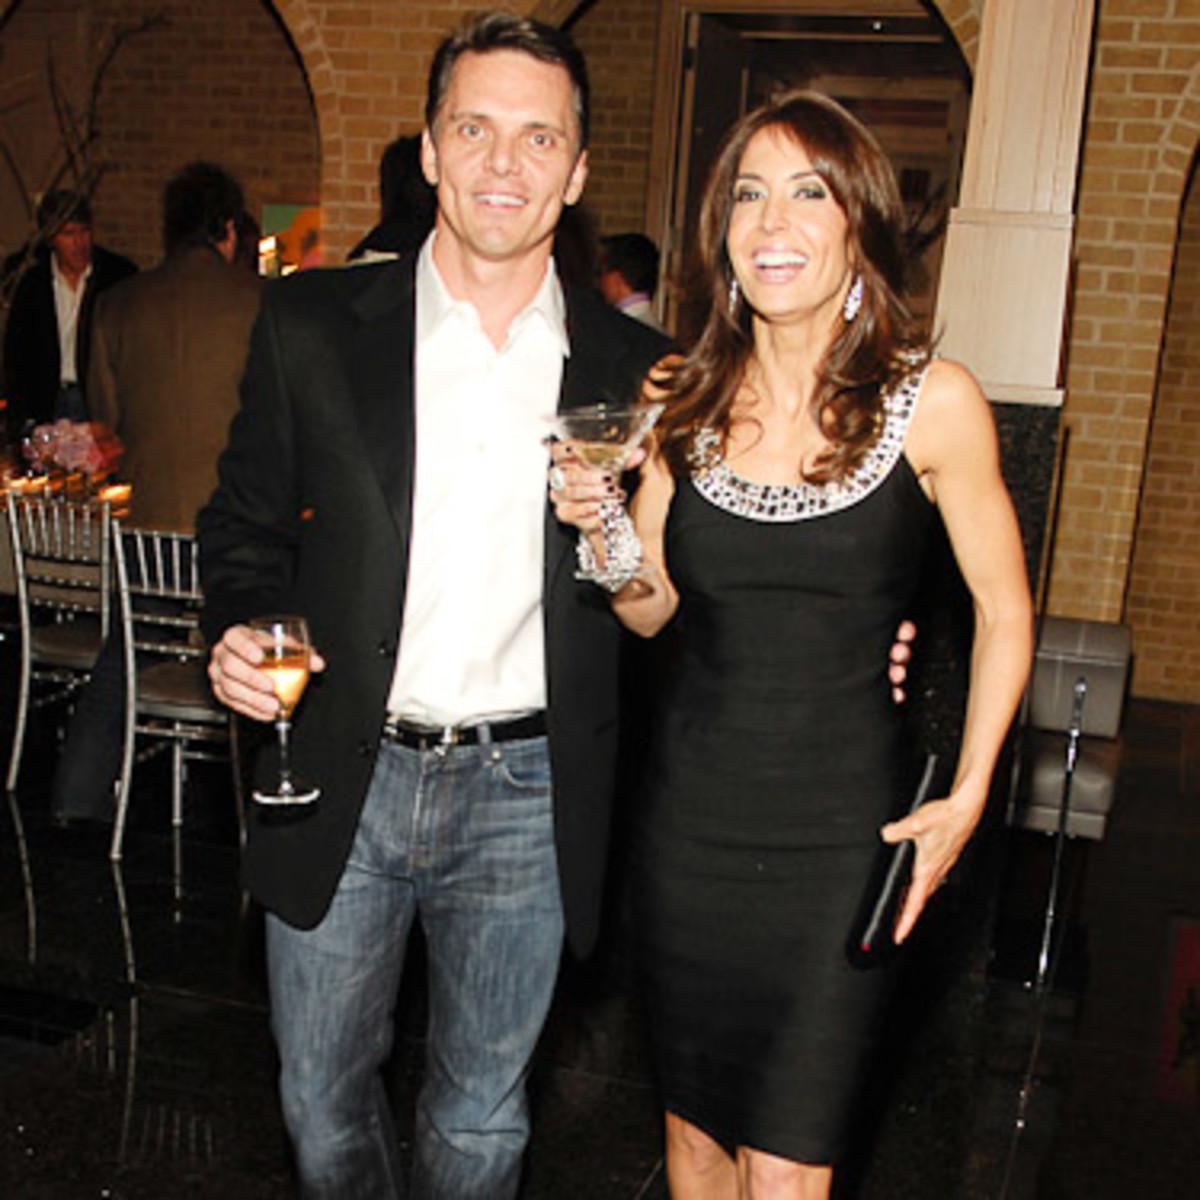 News_Vogue at Becca_Feb. 2010_Ron Simon_Sarah Simon